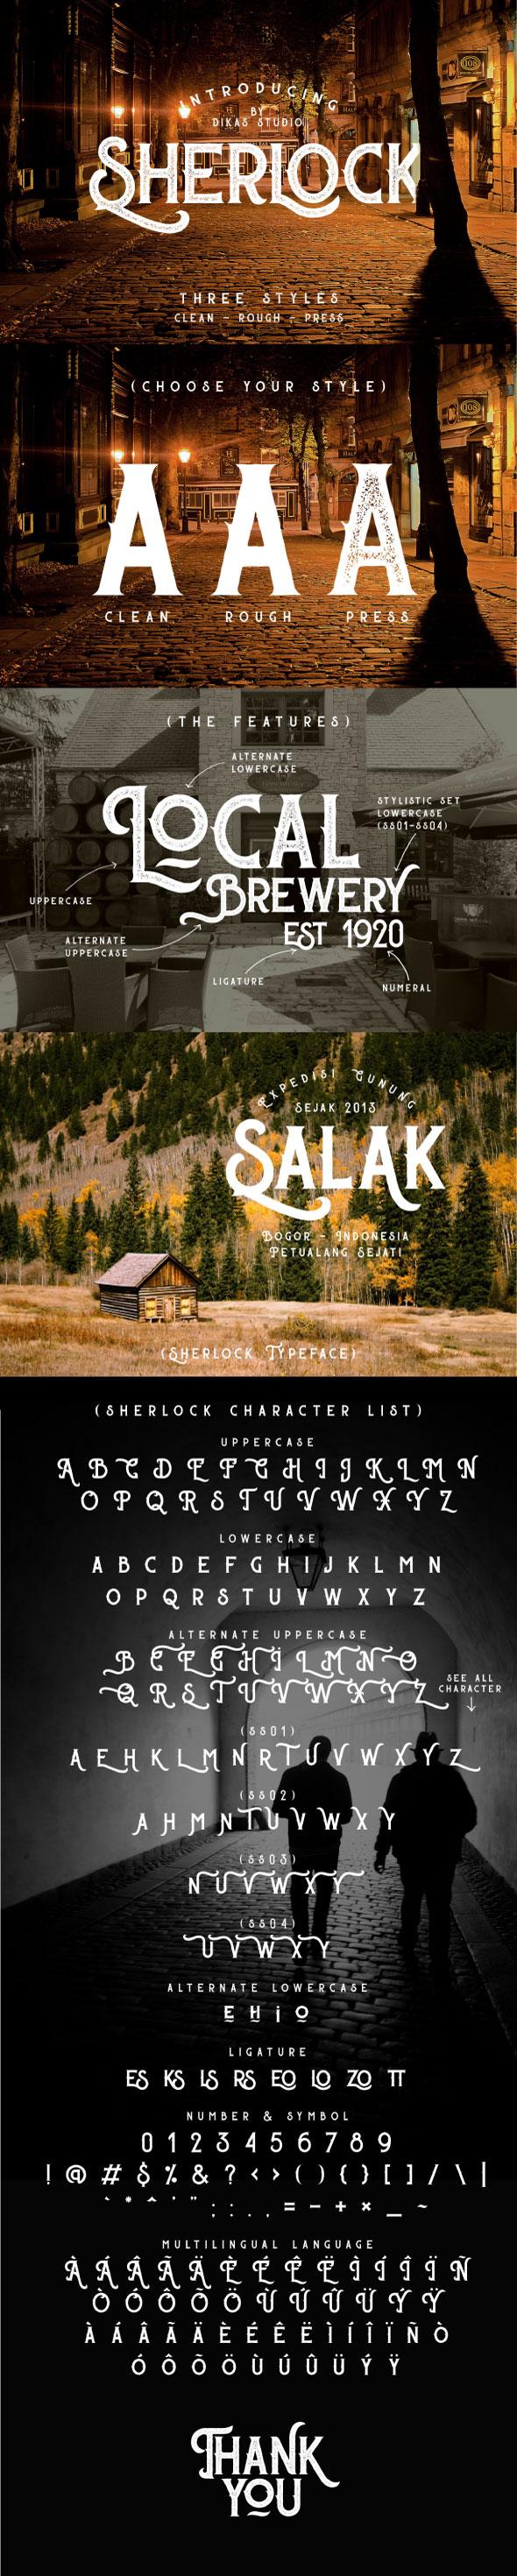 Sherlock Typeface - 3 Font Styles - Grunge Decorative